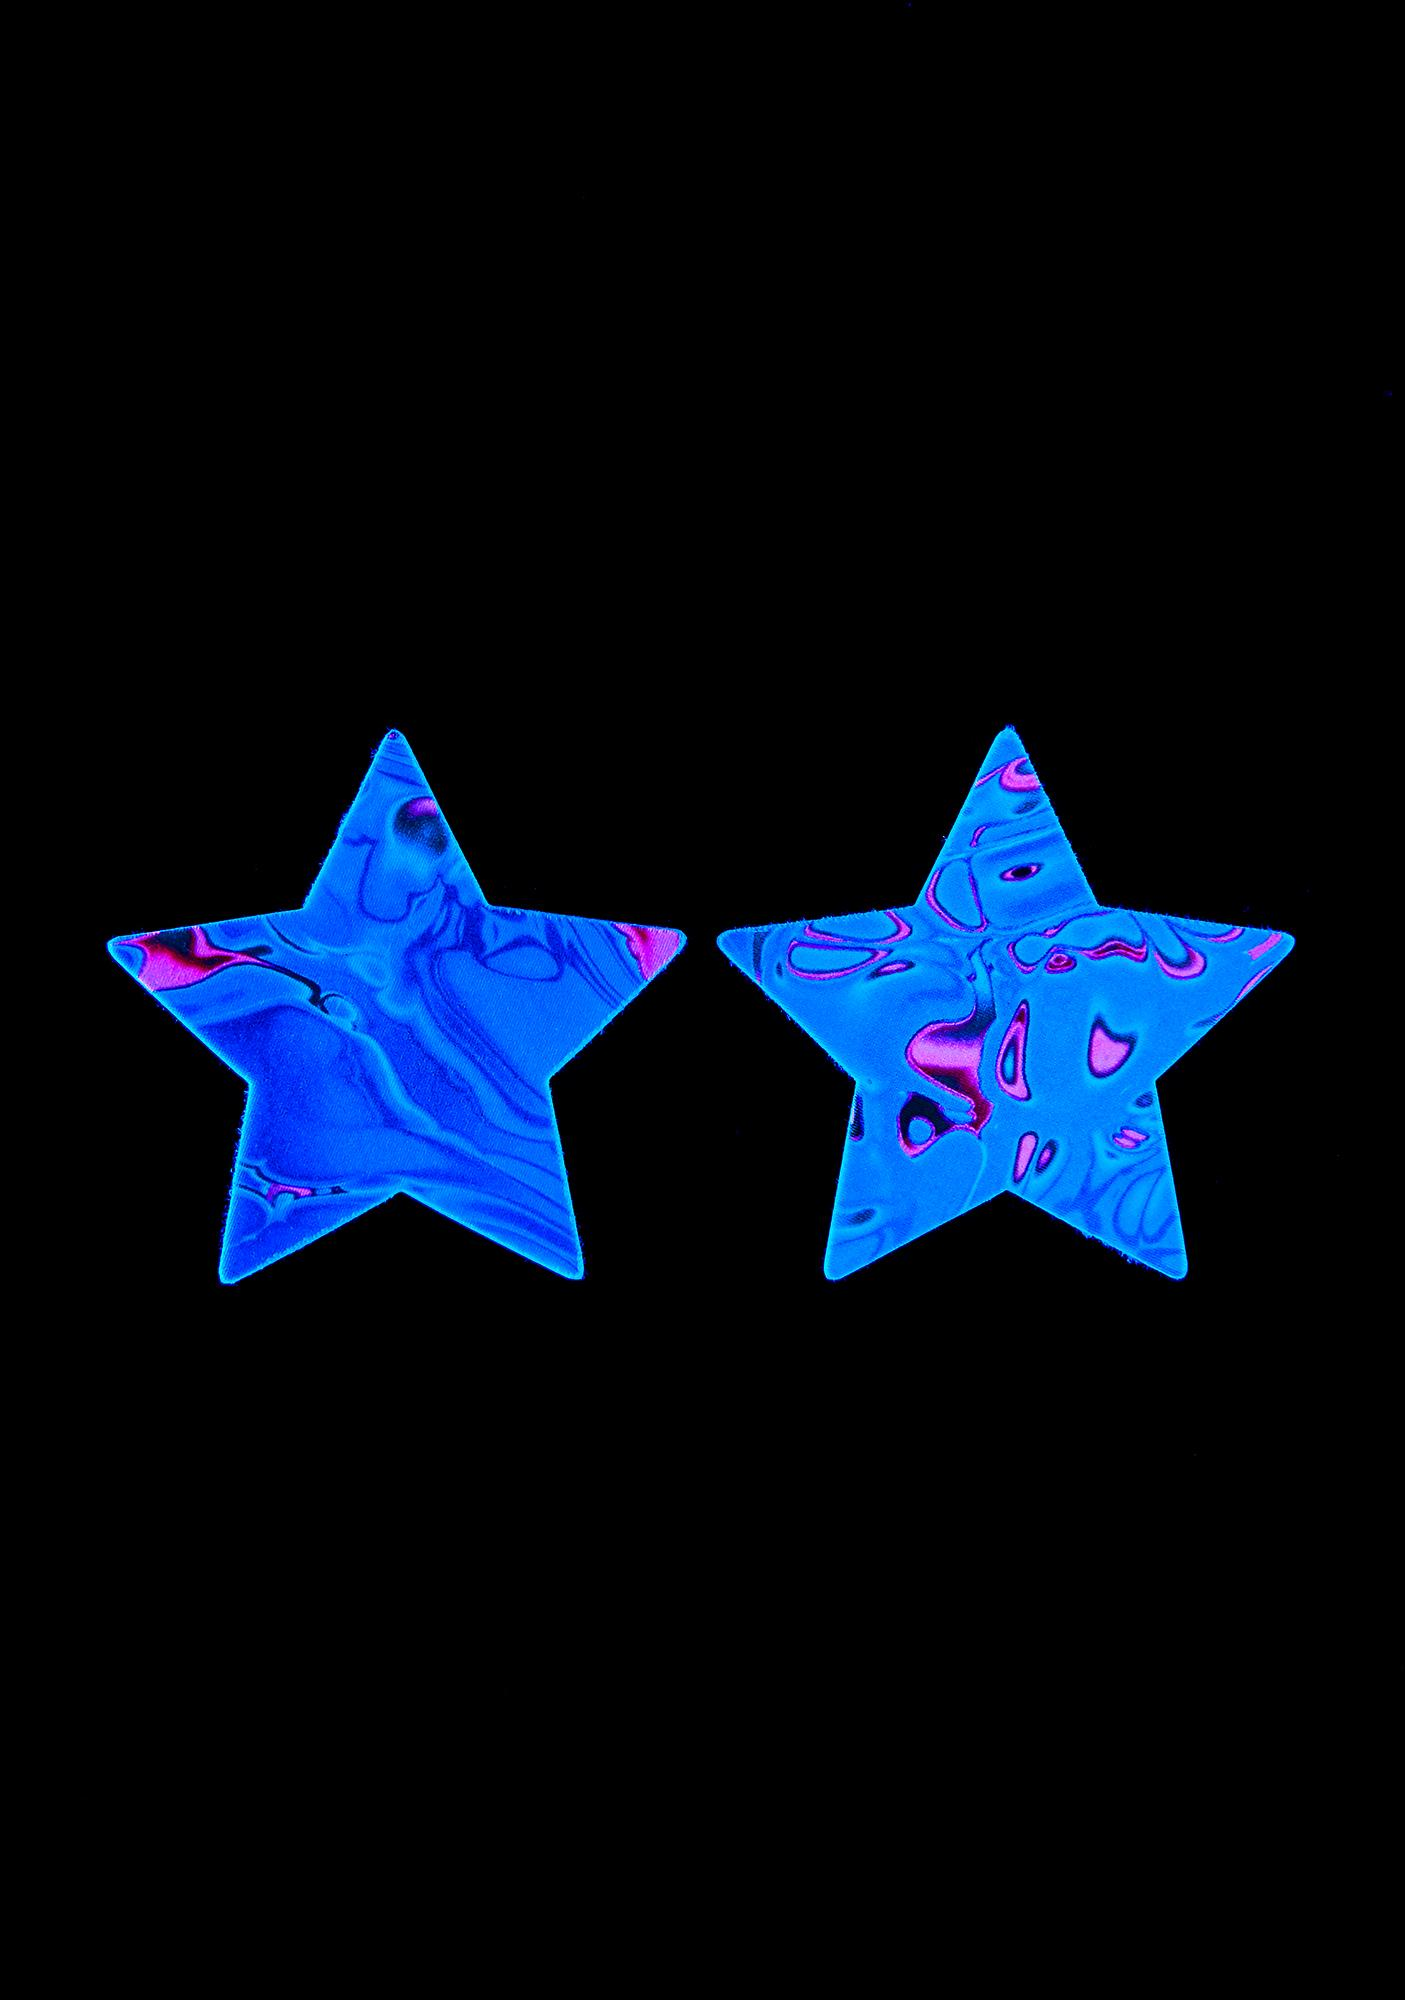 Neva Nude Starry Nights UV Reactive Pasties